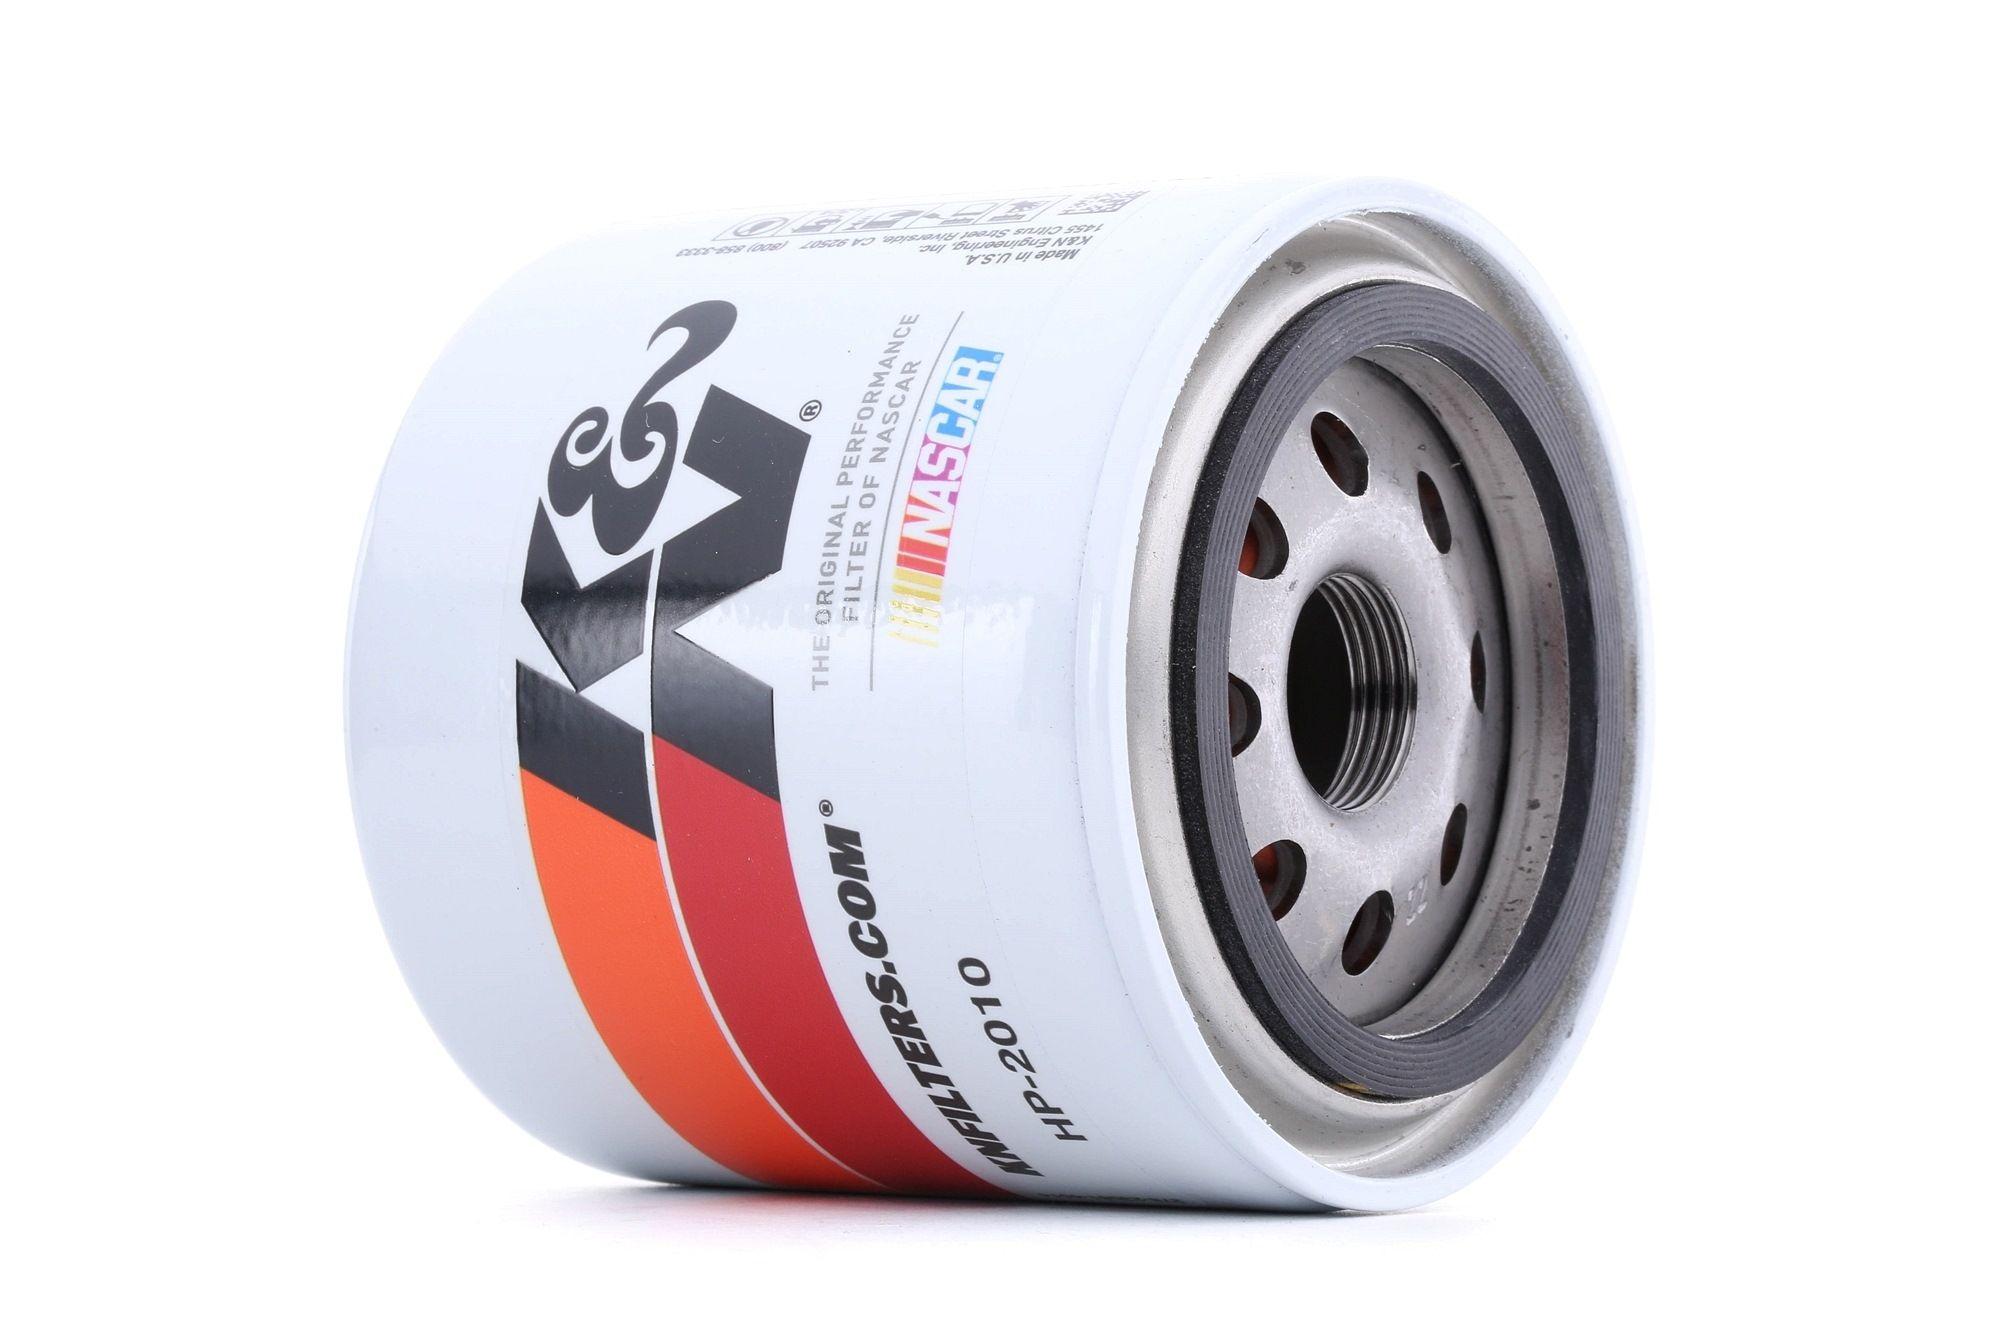 Origine Filtre à huile K&N Filters HP-2010 (Ø: 93mm, Ø: 93mm, Hauteur: 102mm)